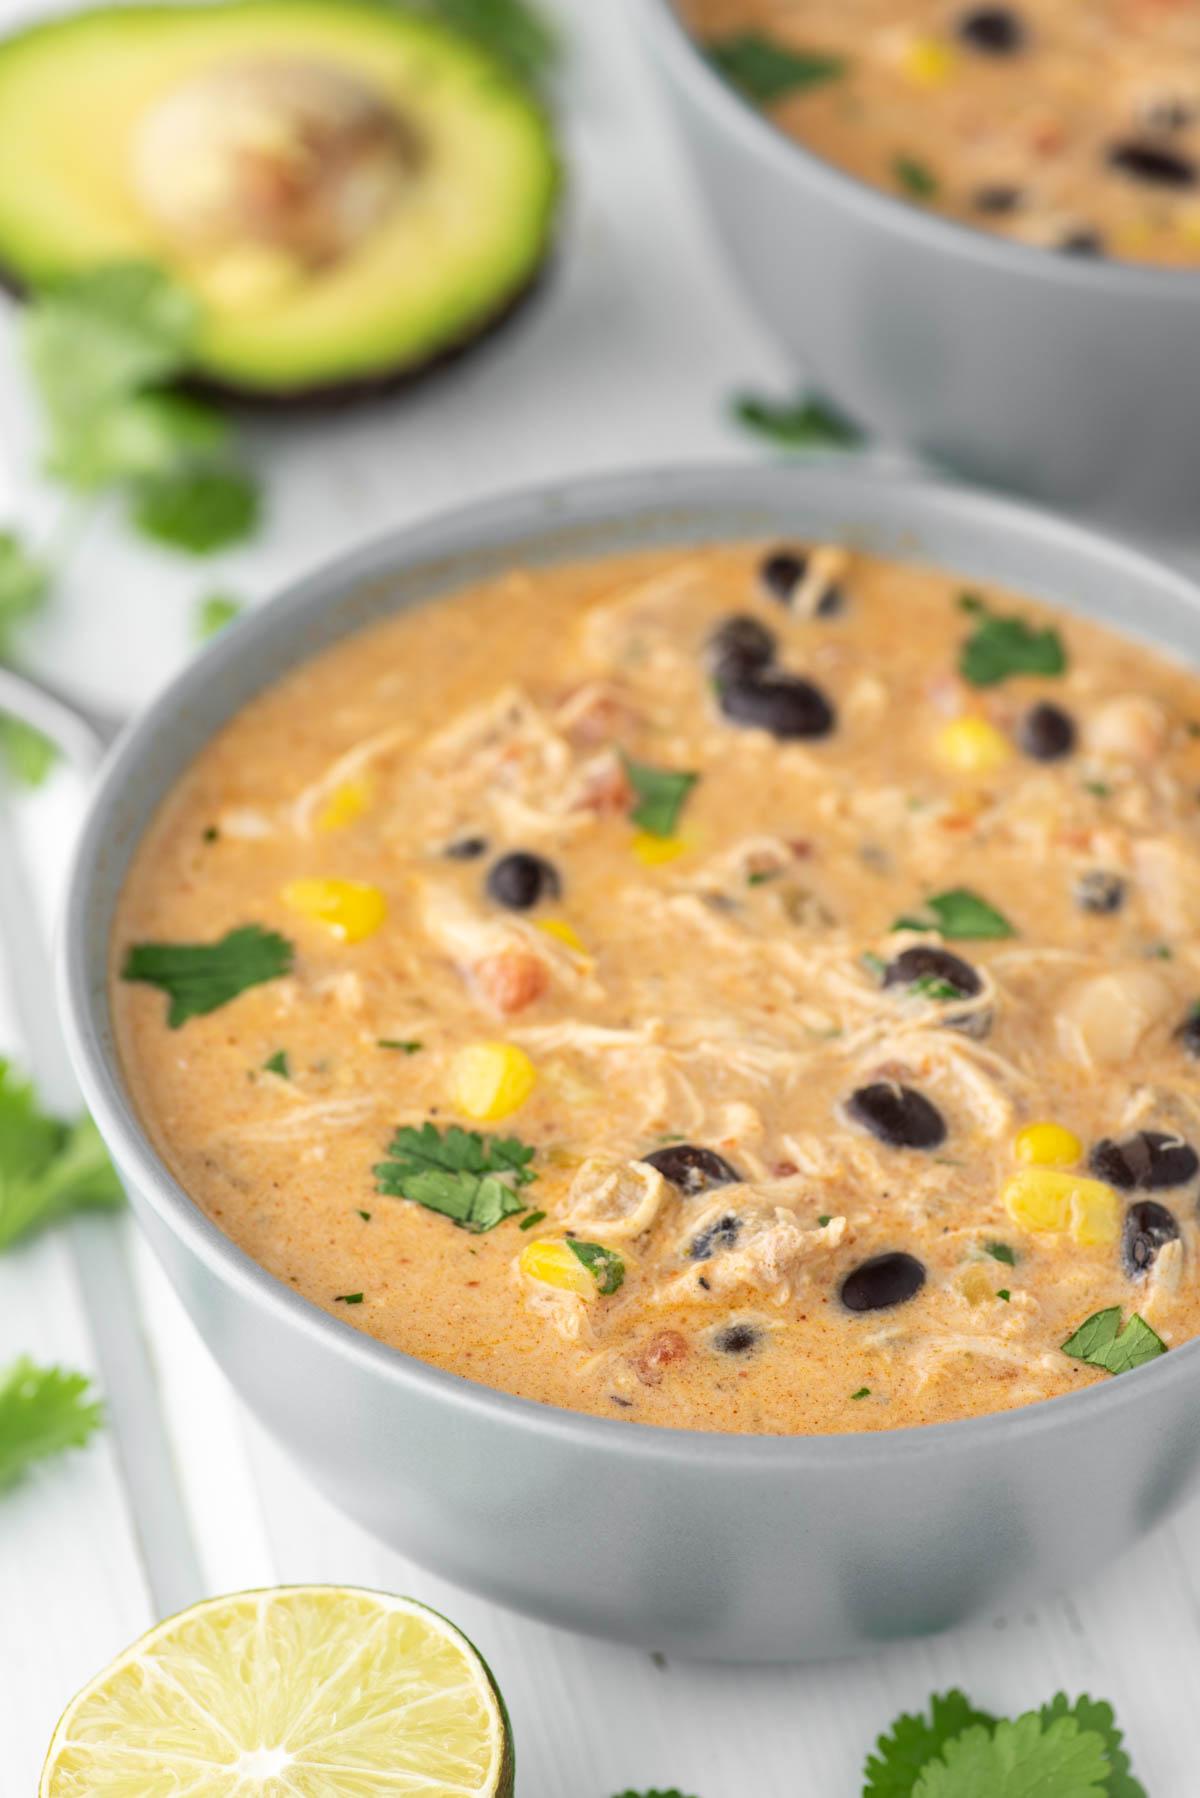 chicken enchilada soup in gray bowl